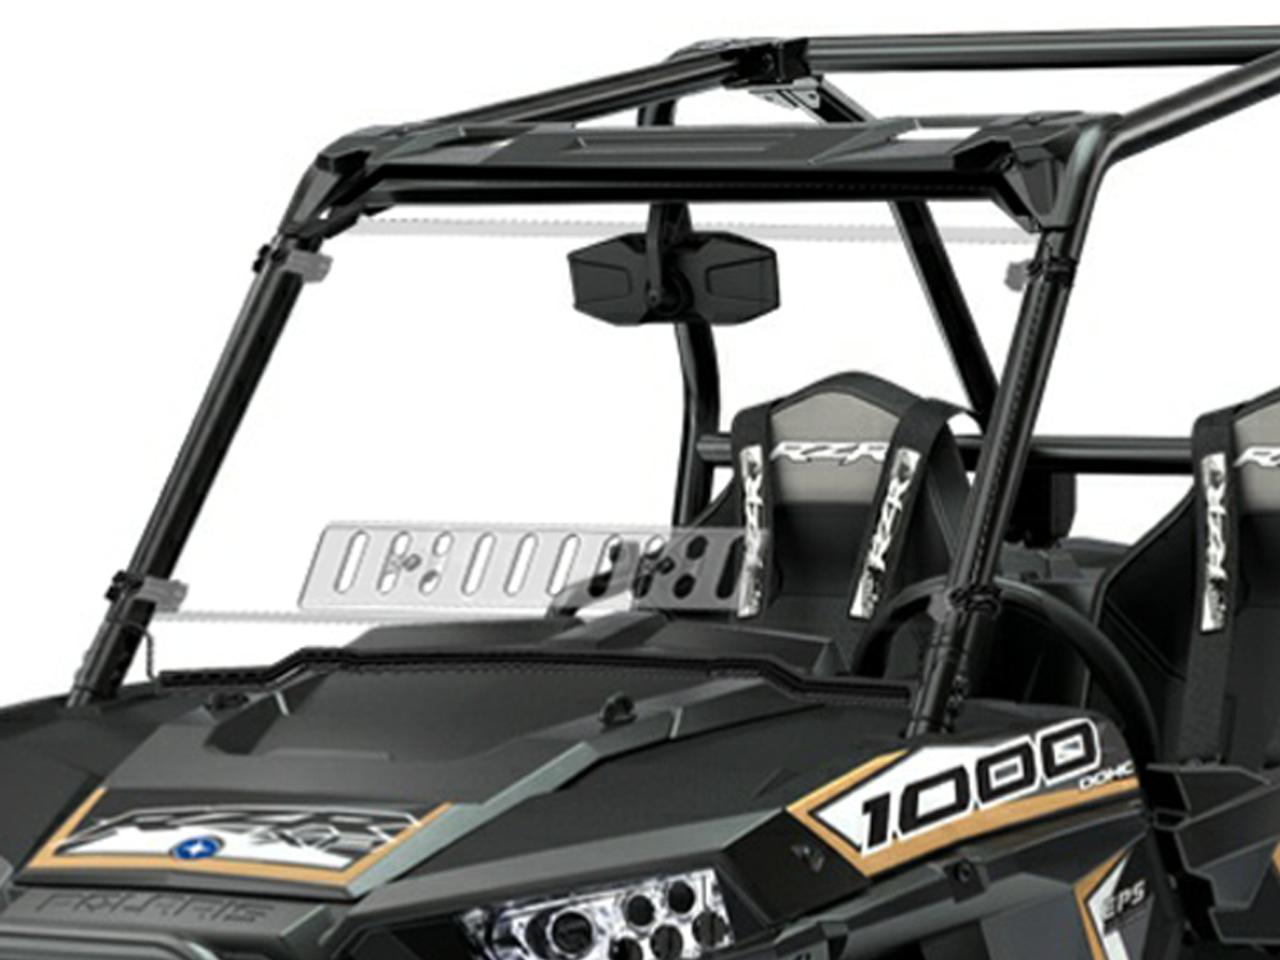 Polaris Rzr 1000 Windshield >> Polaris Rzr 900 1000 Scratch Resistant Venting Windshield